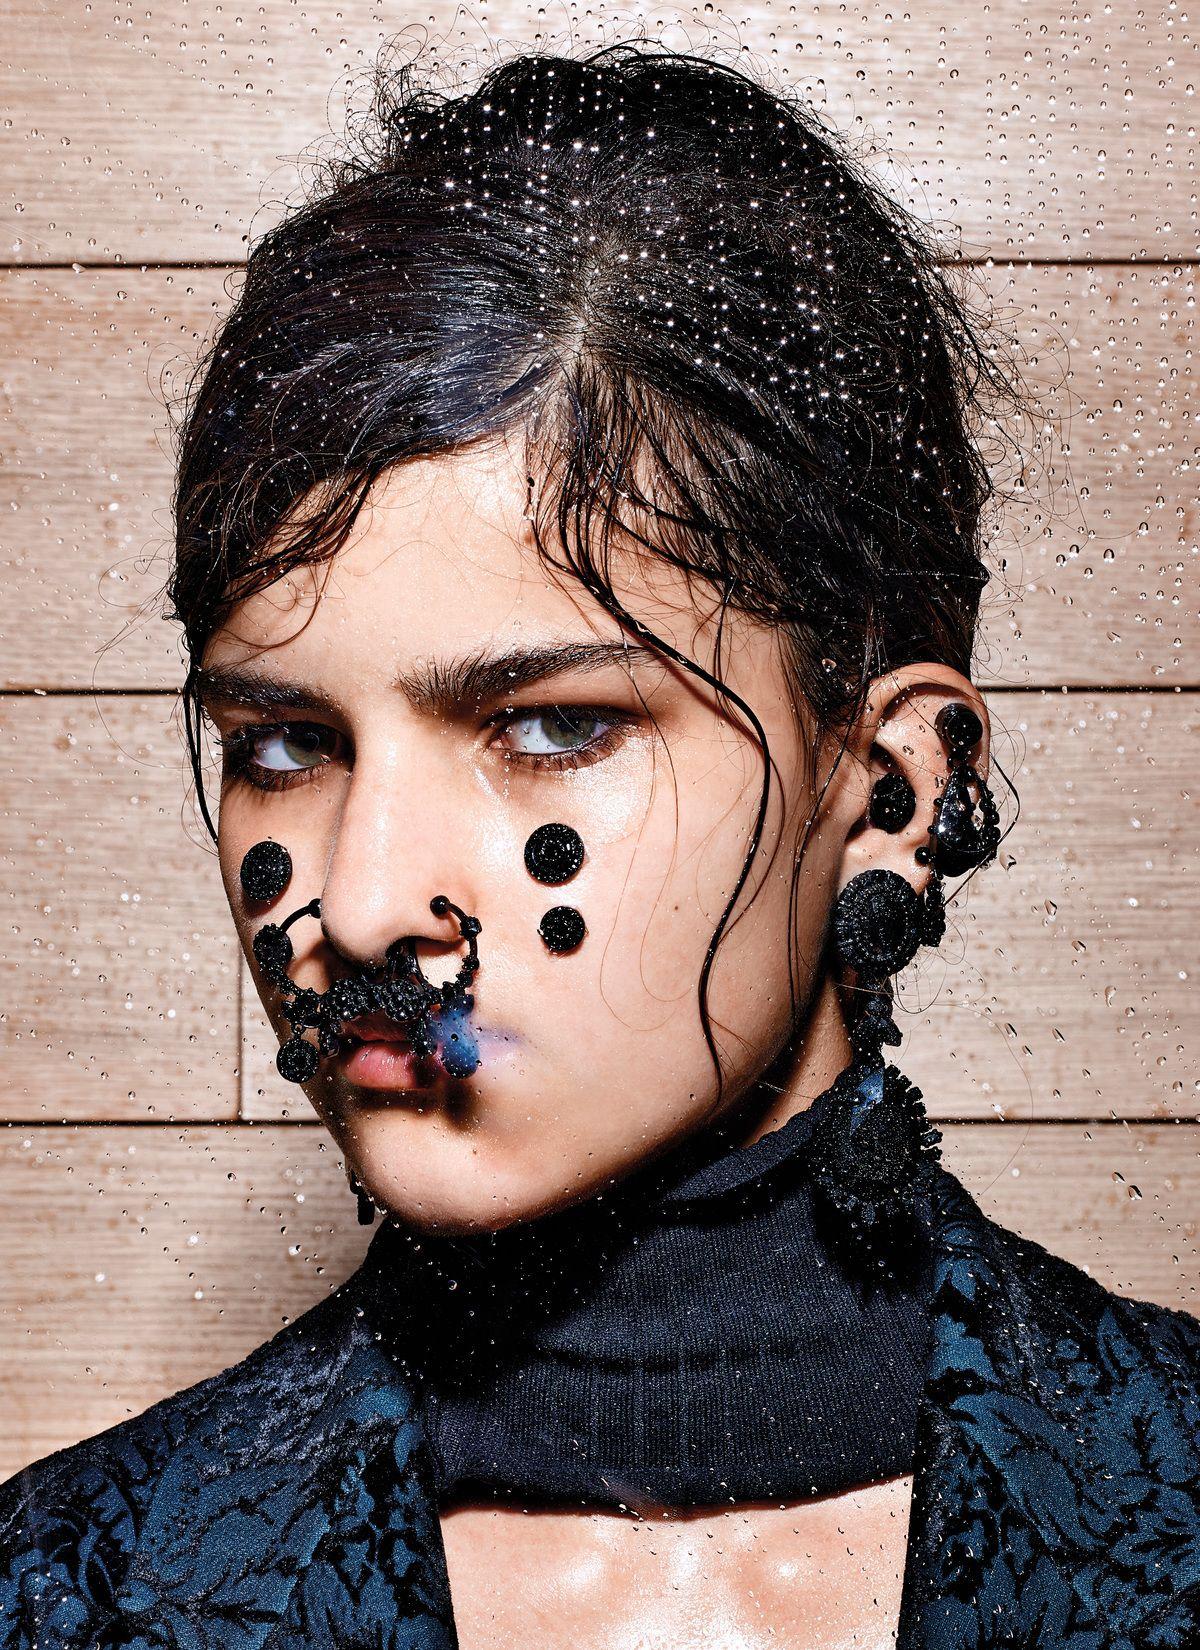 Art + Commerce - Artists - Photographers - Richard Burbridge - Vogue Italia November 2015